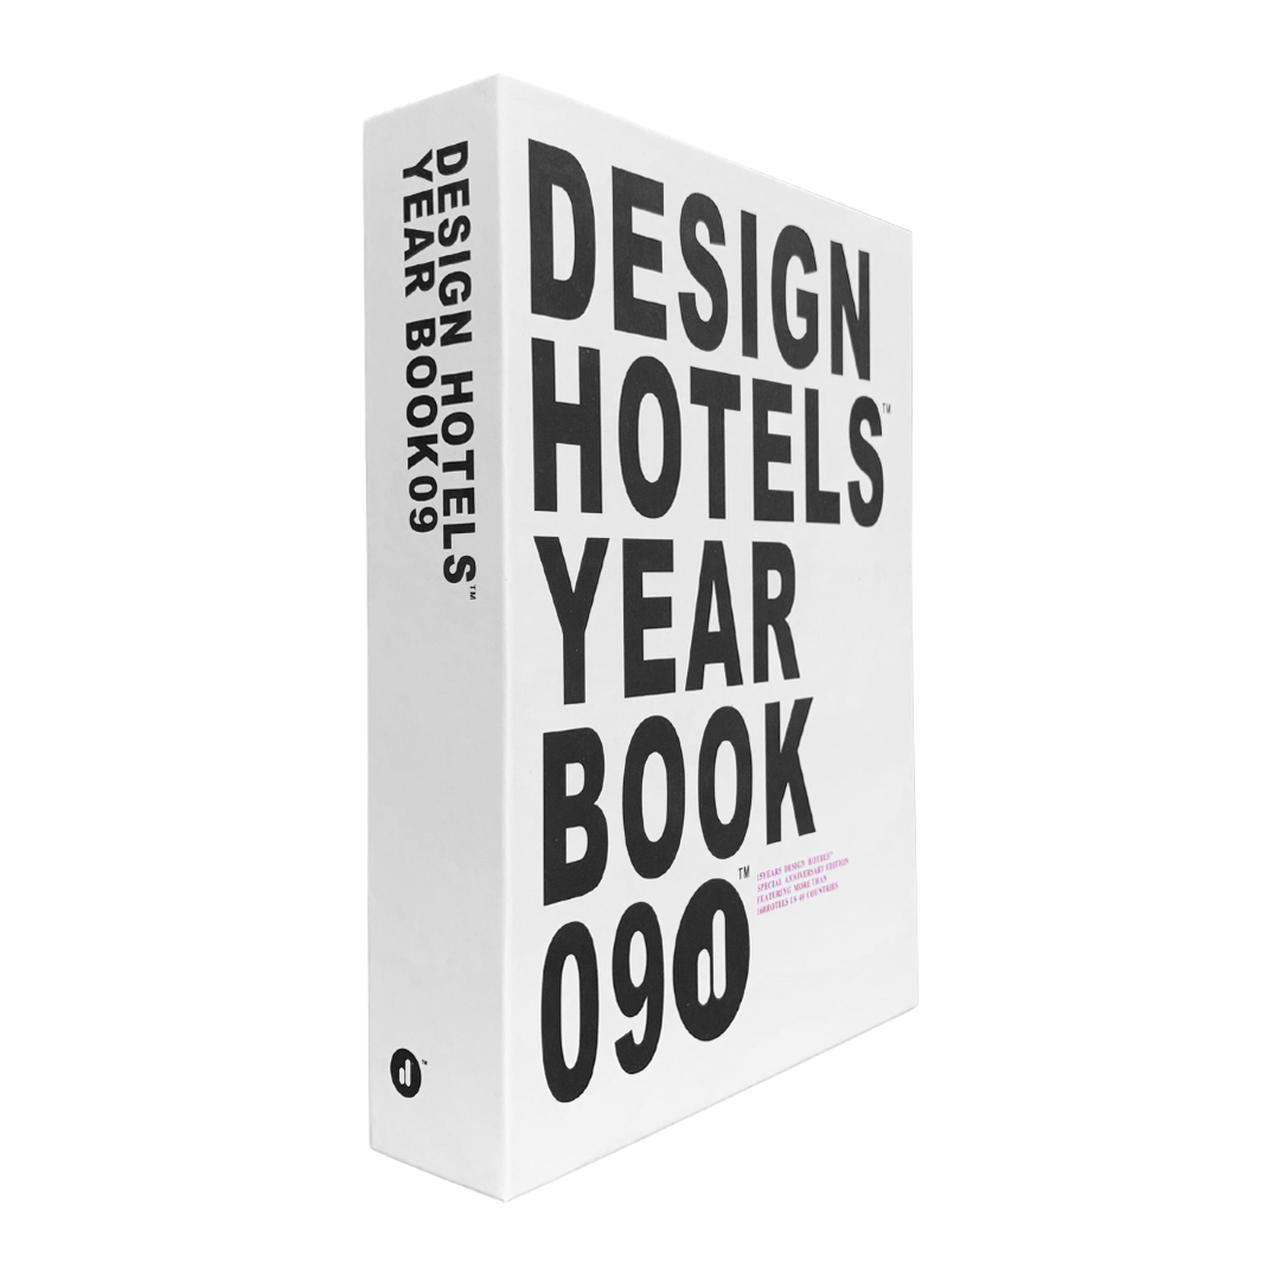 Caixa Livro Decorativa Design Hotels